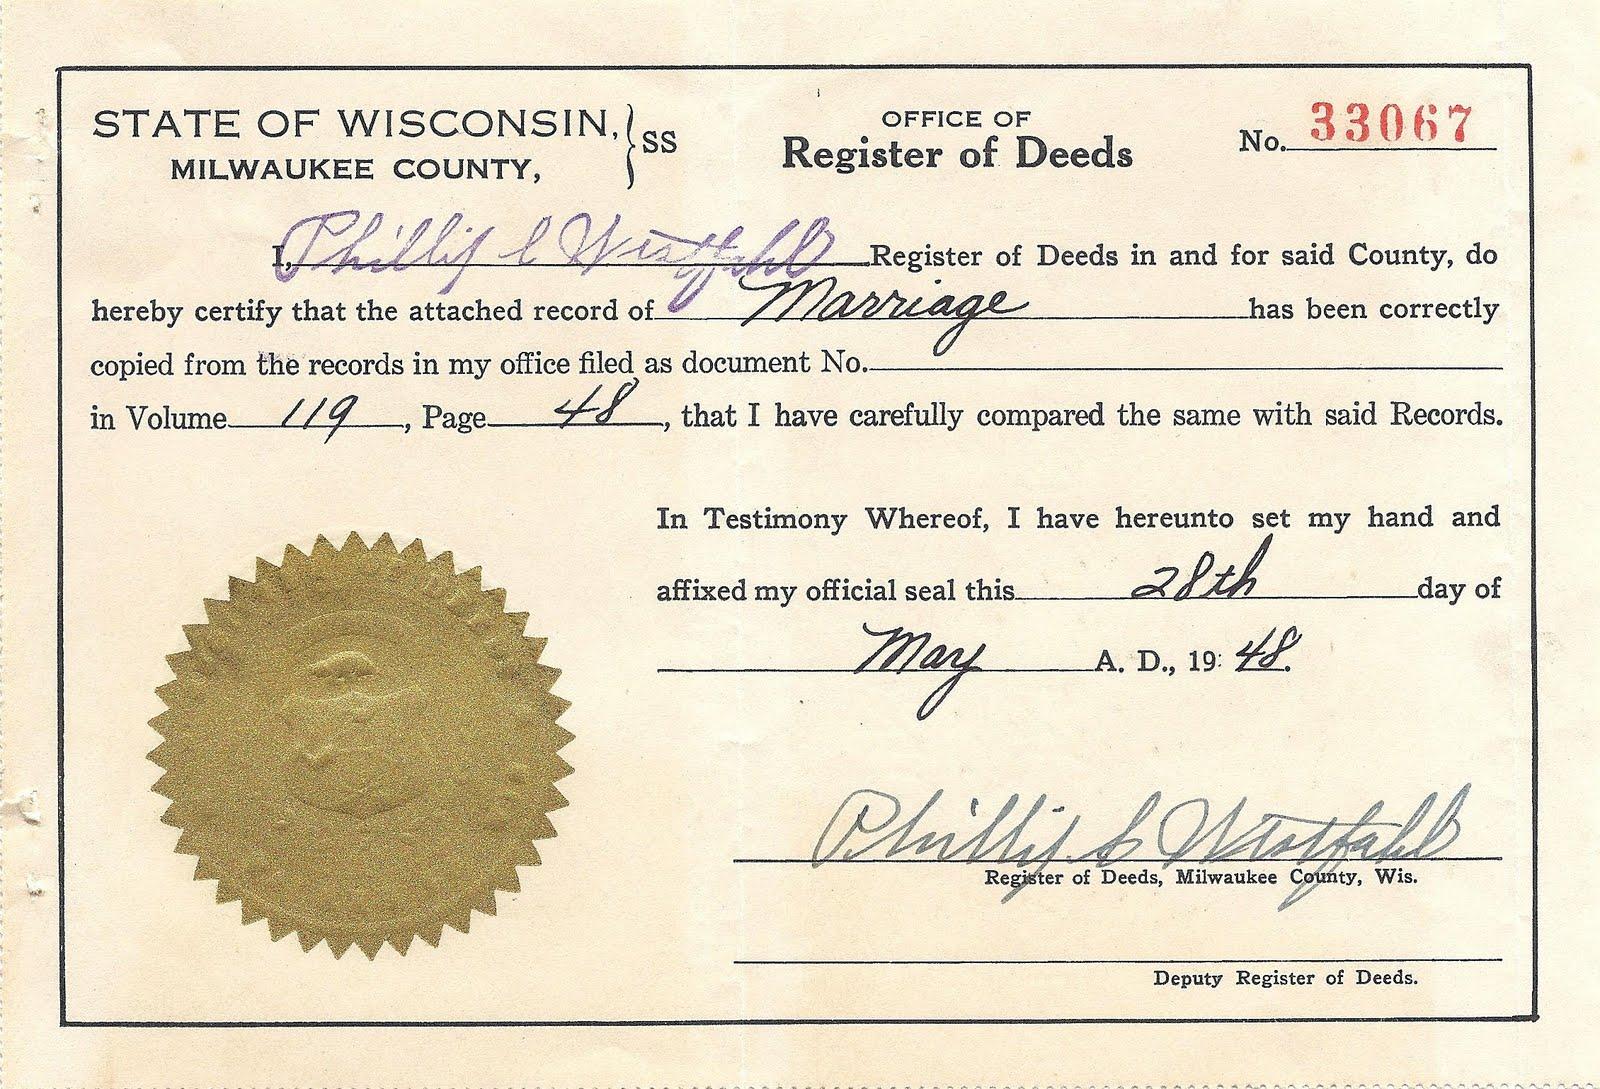 Free Resume 2018 Copy Of Marriage Certificate Hawaii Free Resume